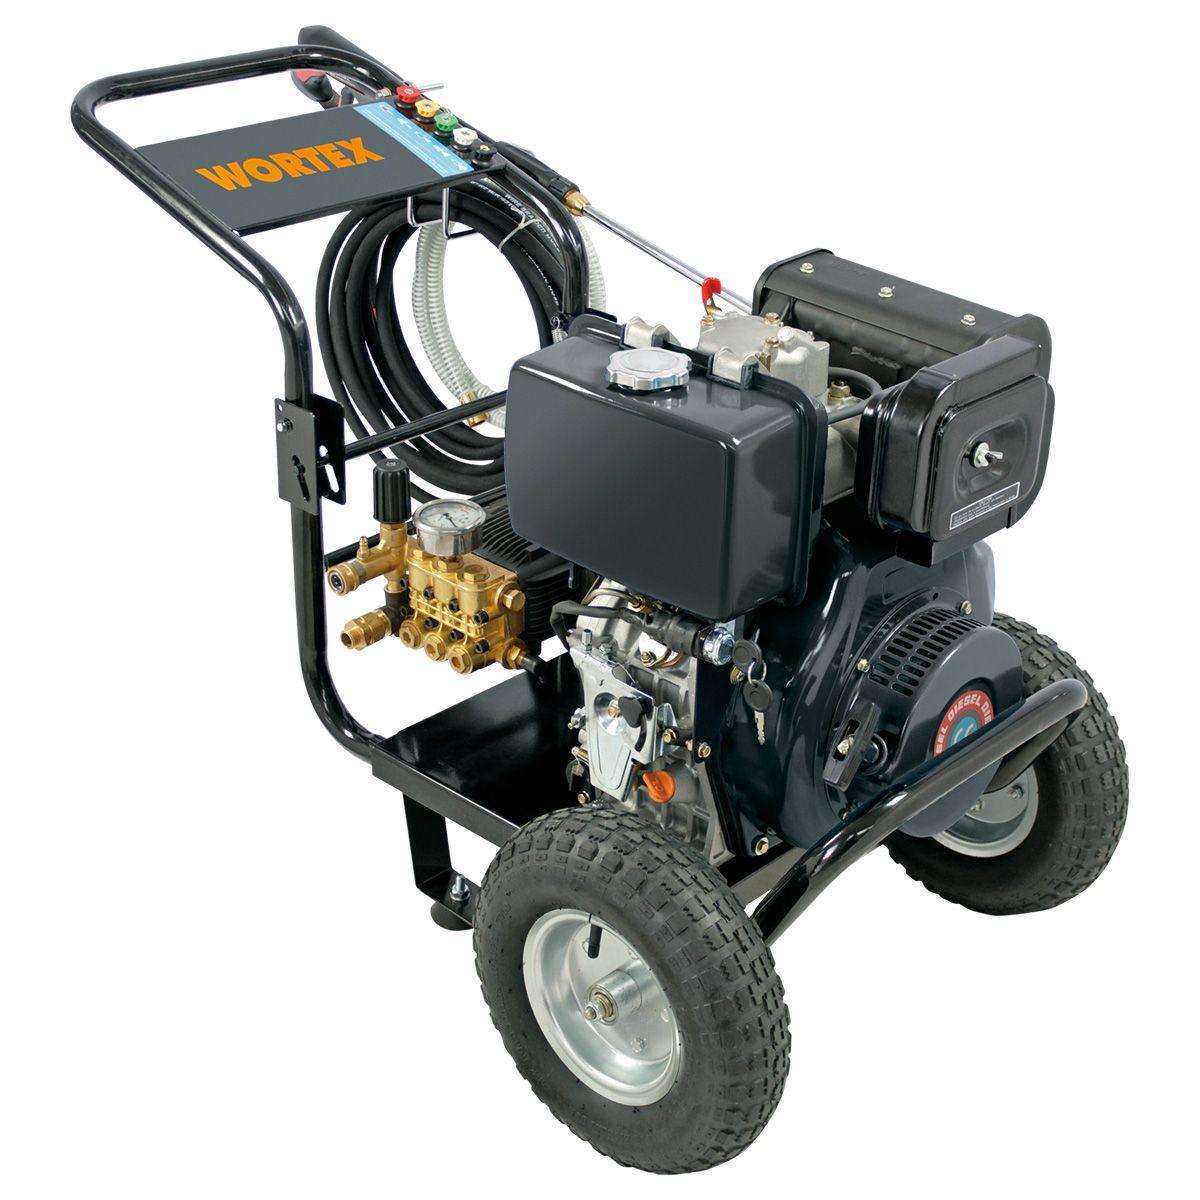 WORTEX HW 18/250-E Idropulitrice 248bar Benzina